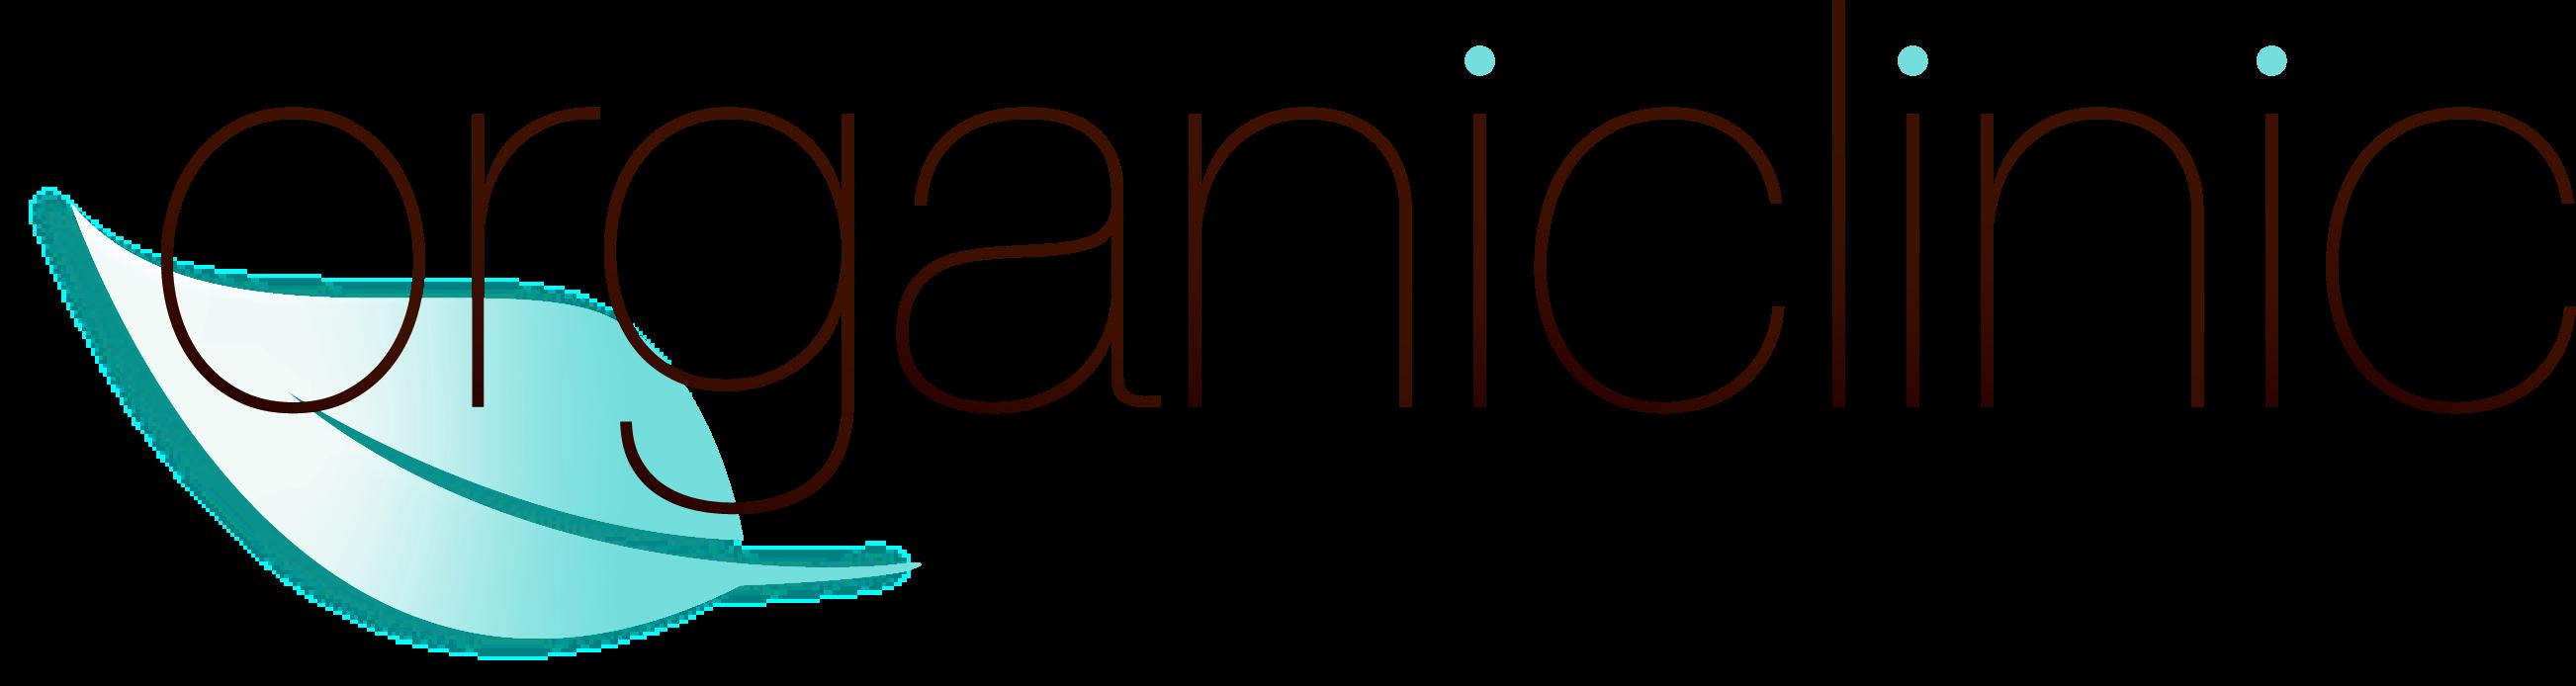 OrganiClinic logo